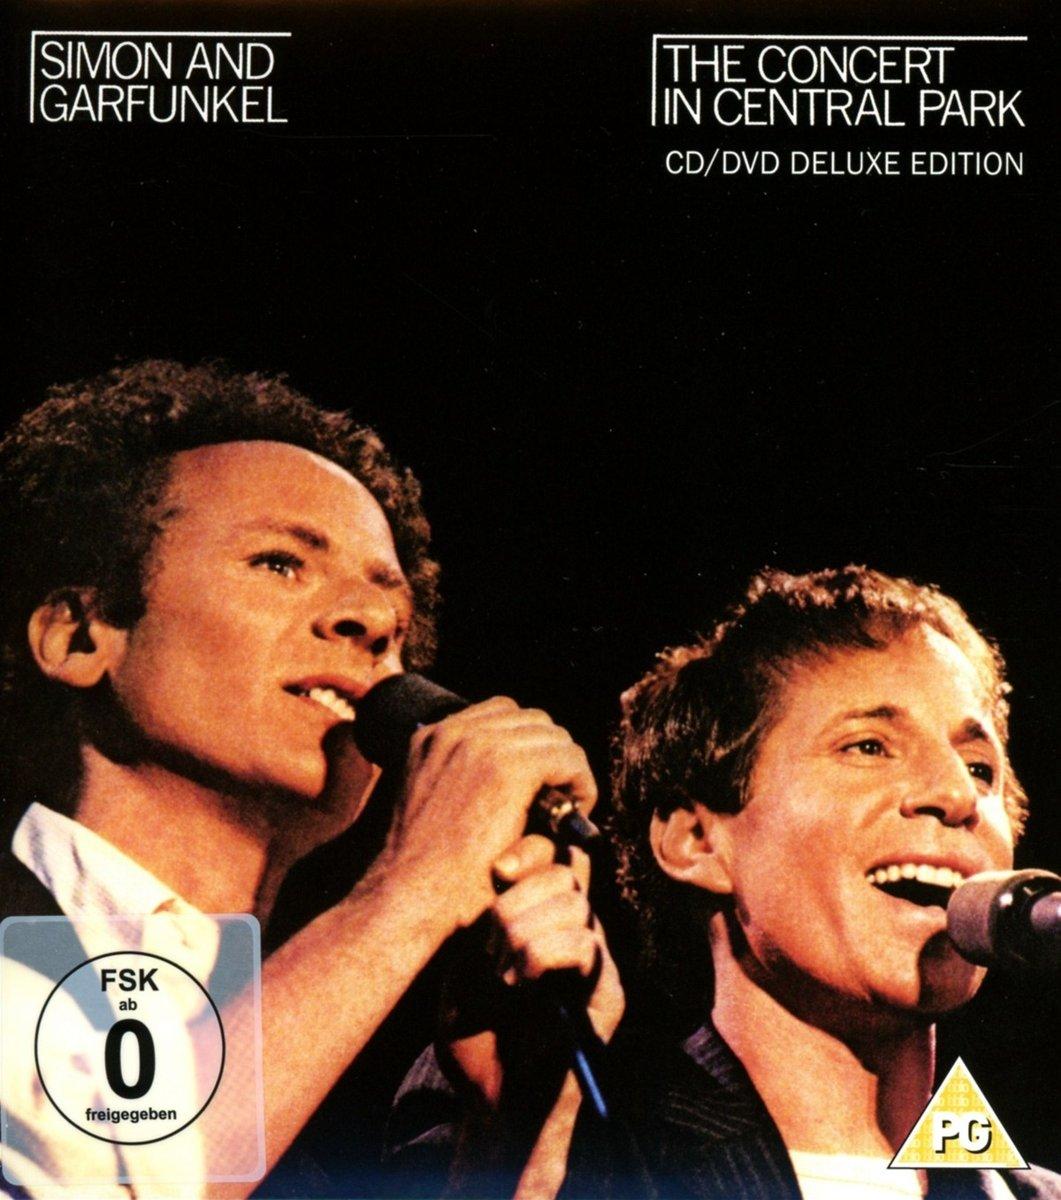 Simon And Garfunkel 2014